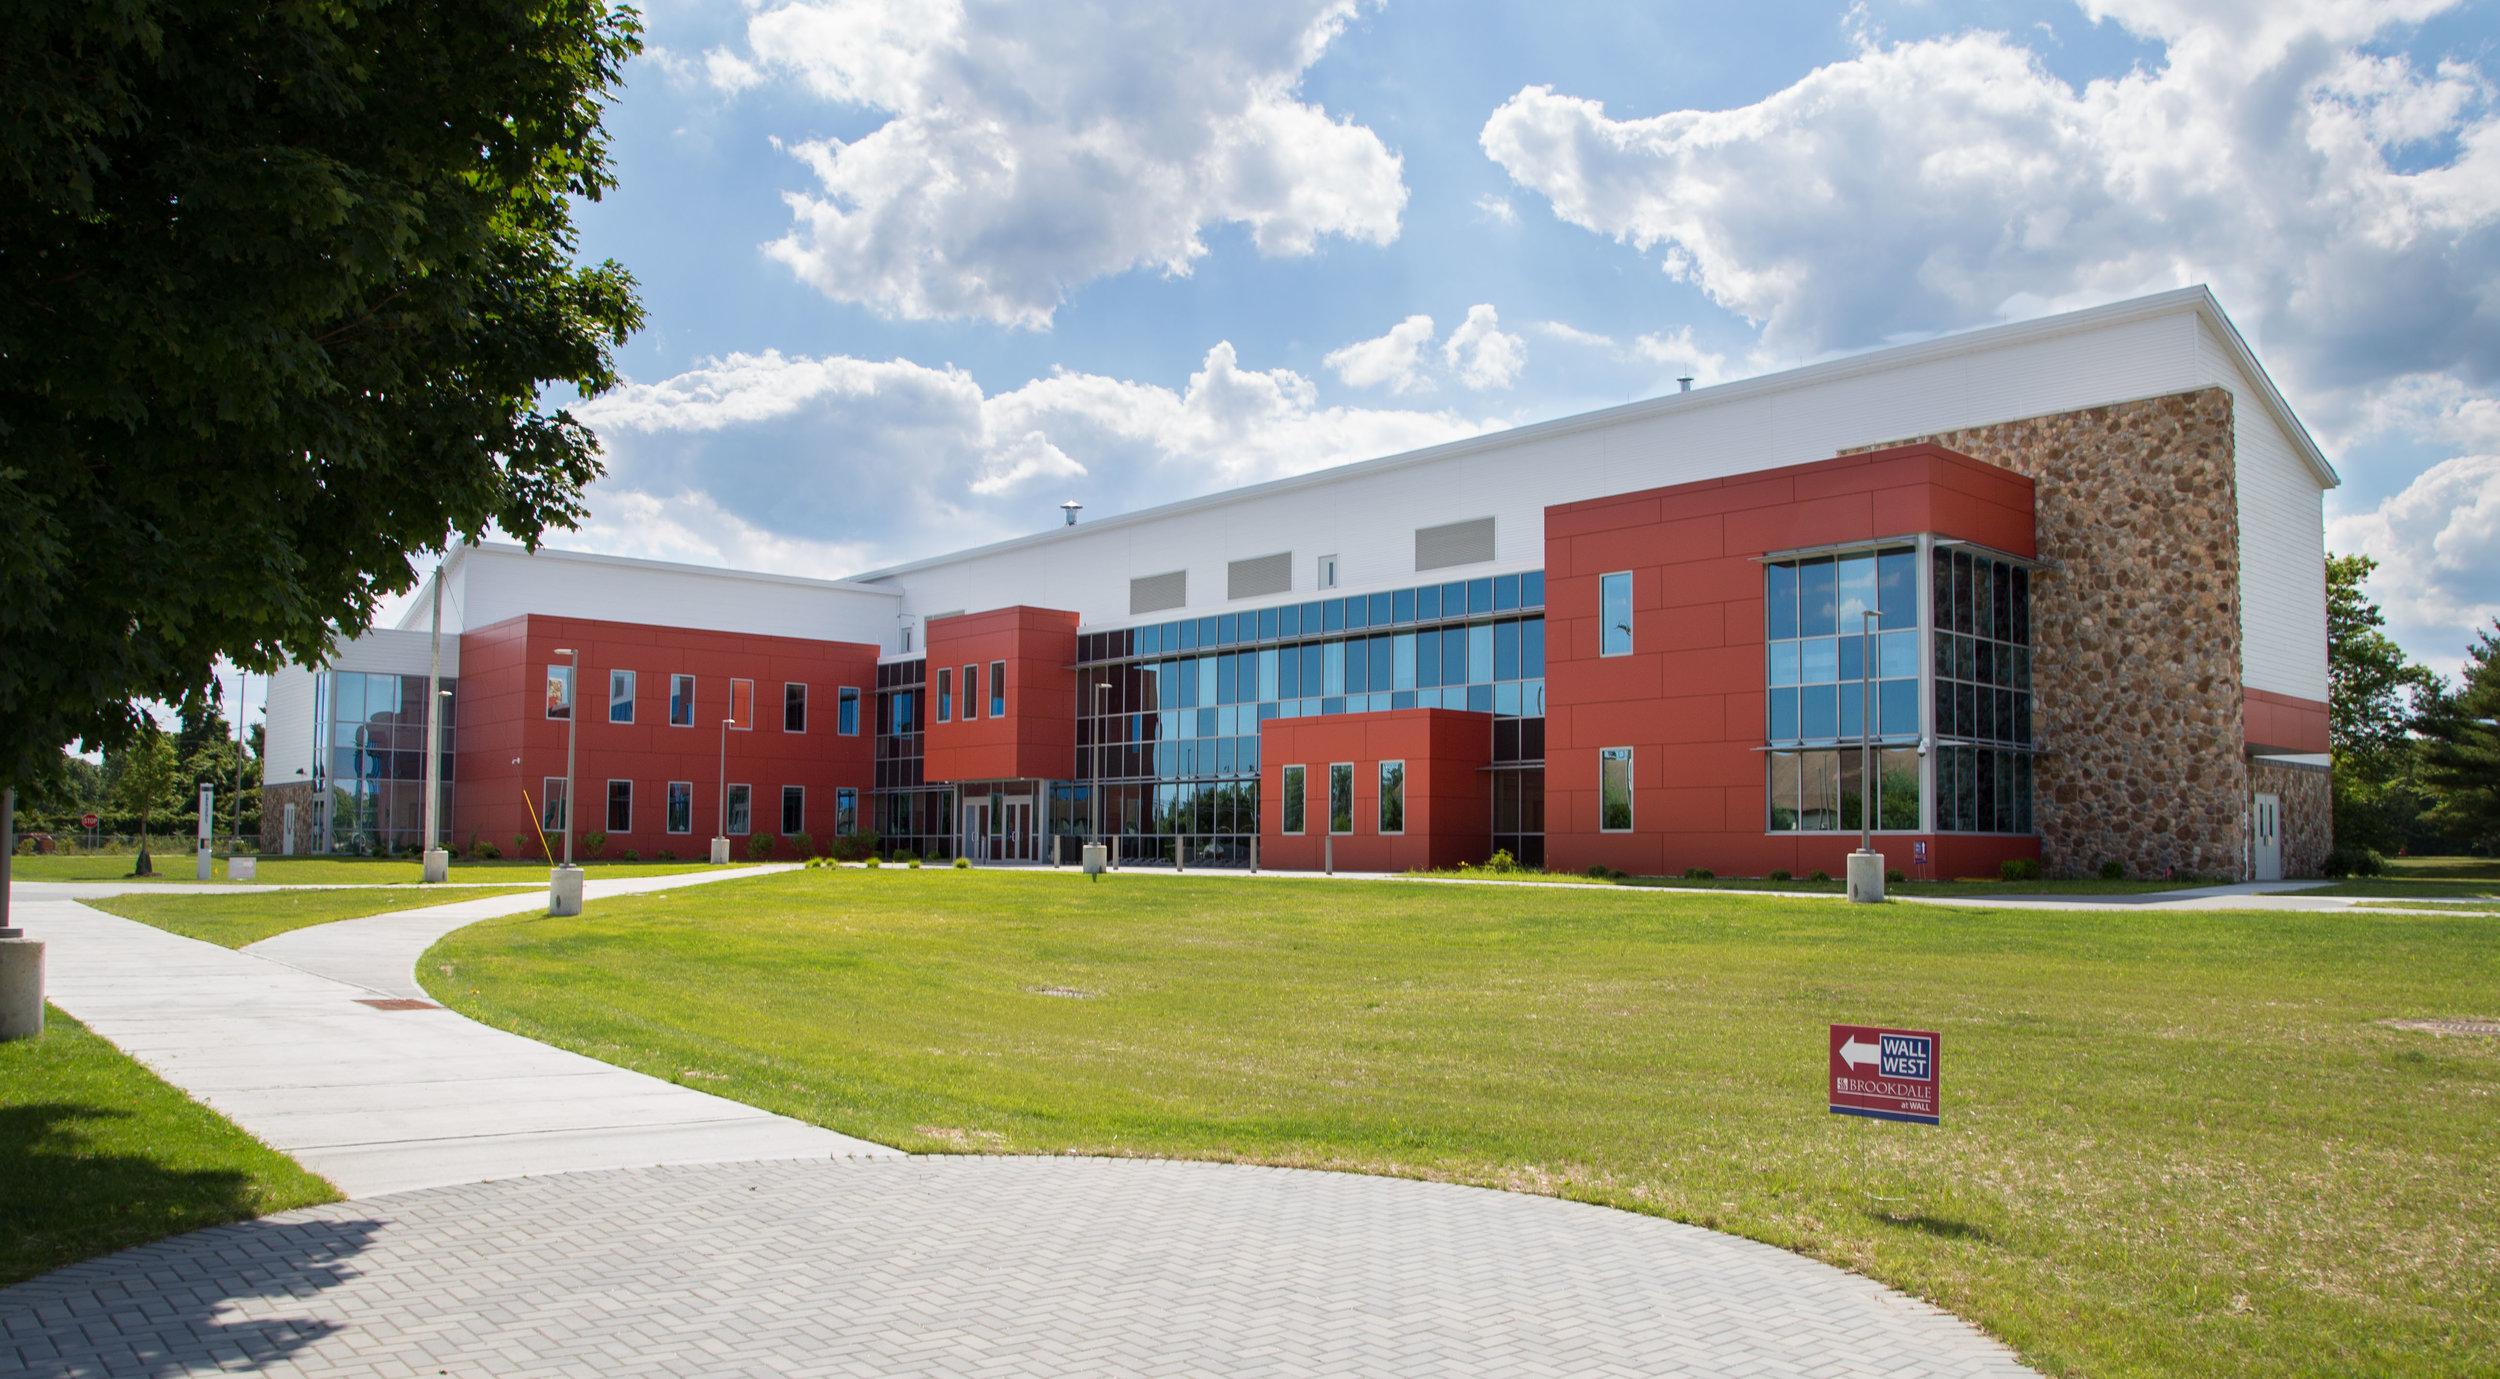 Brookdale Community College - Master Plan Redevelopment